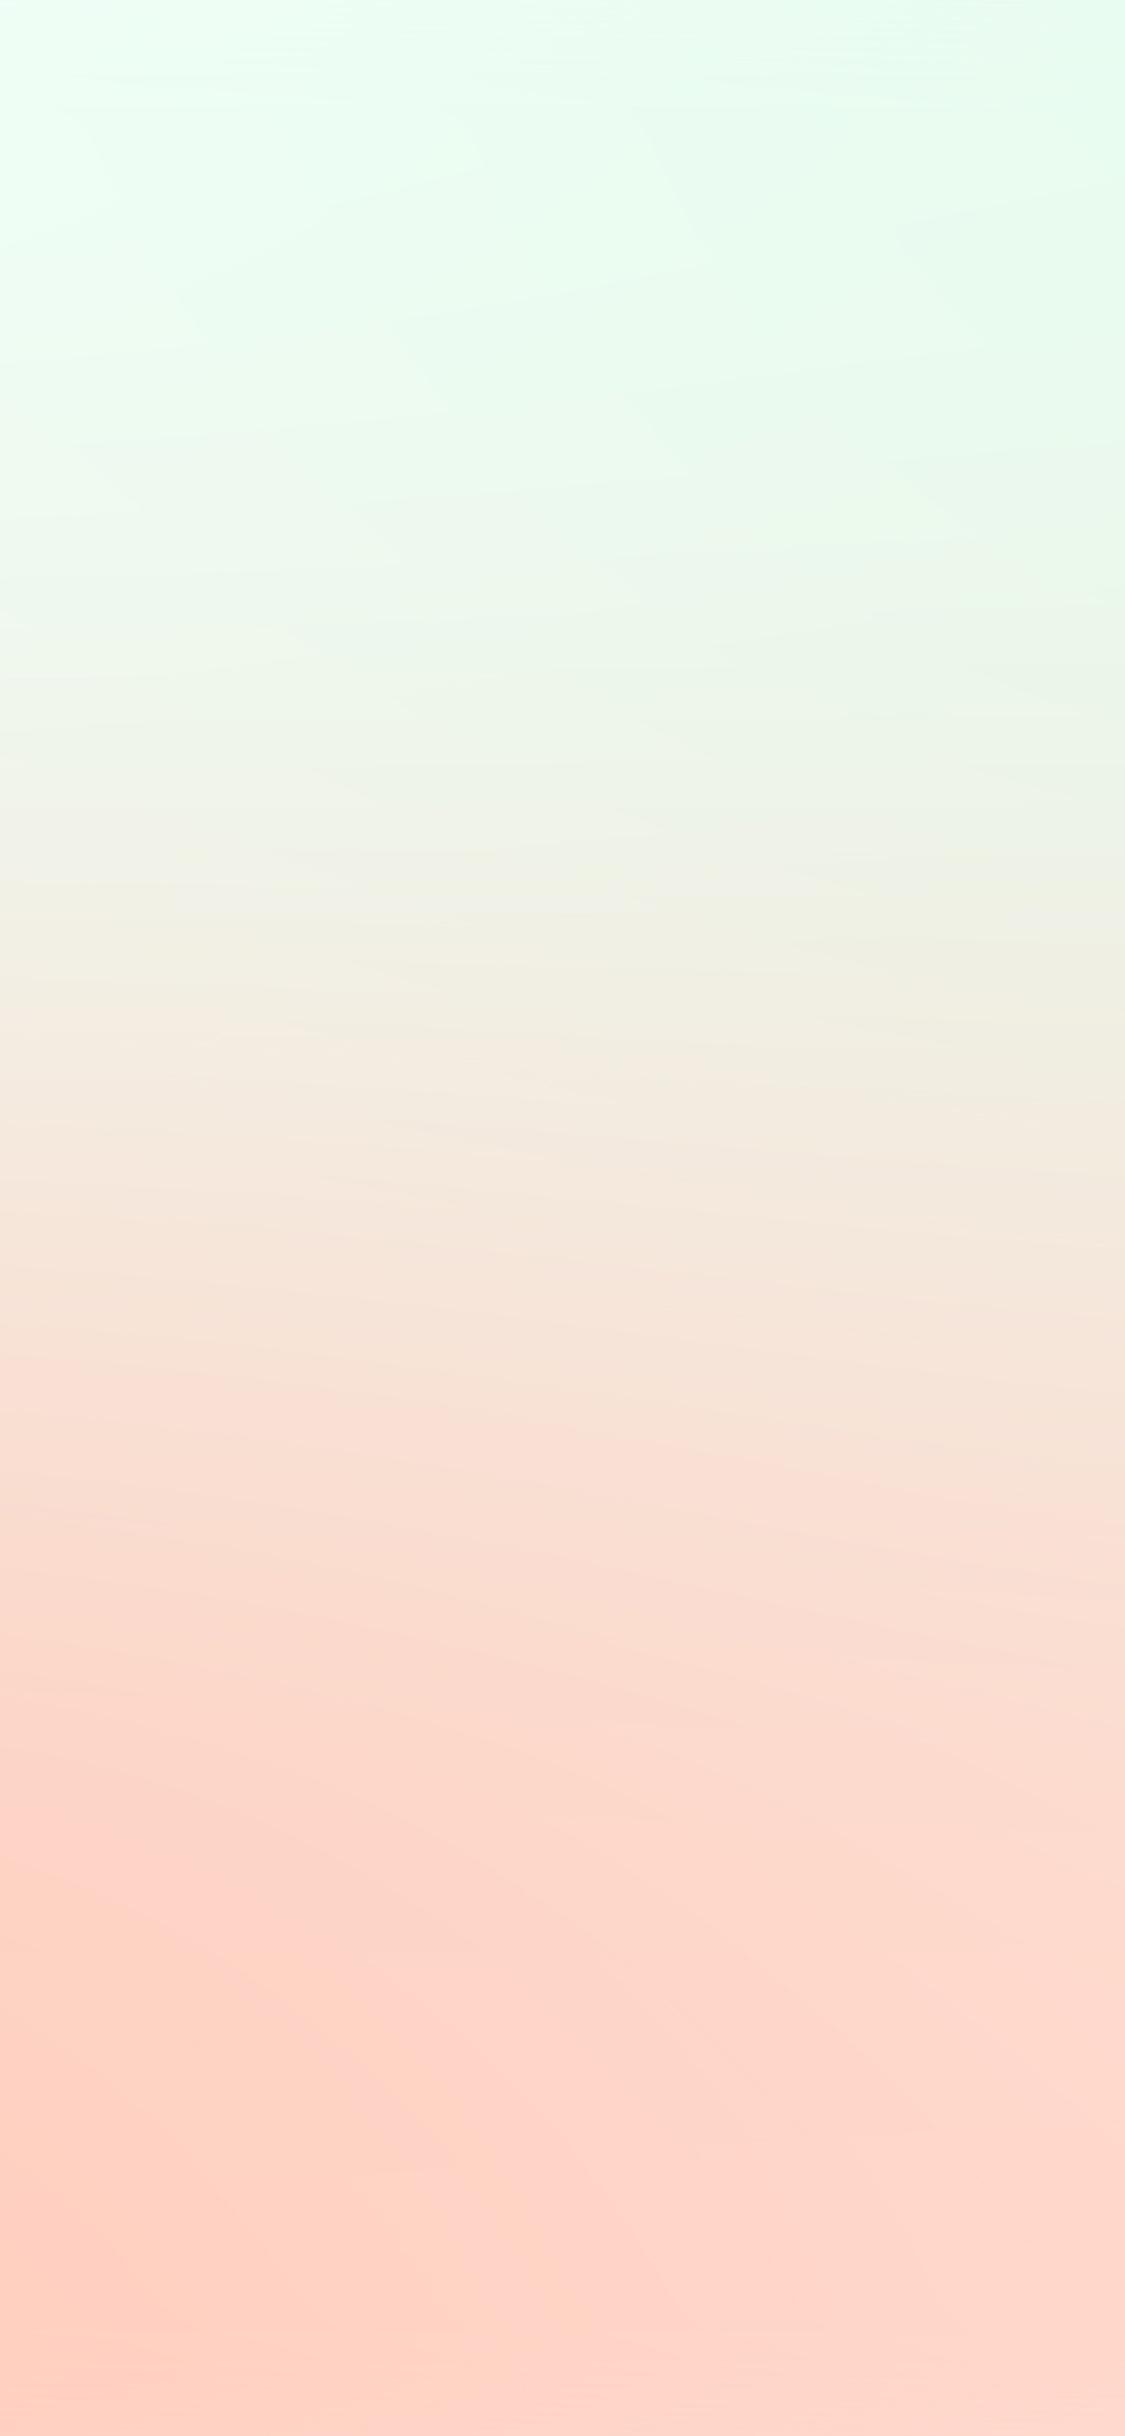 iPhoneXpapers.com-Apple-iPhone-wallpaper-sk10-soft-pastel-sky-blur-gradation